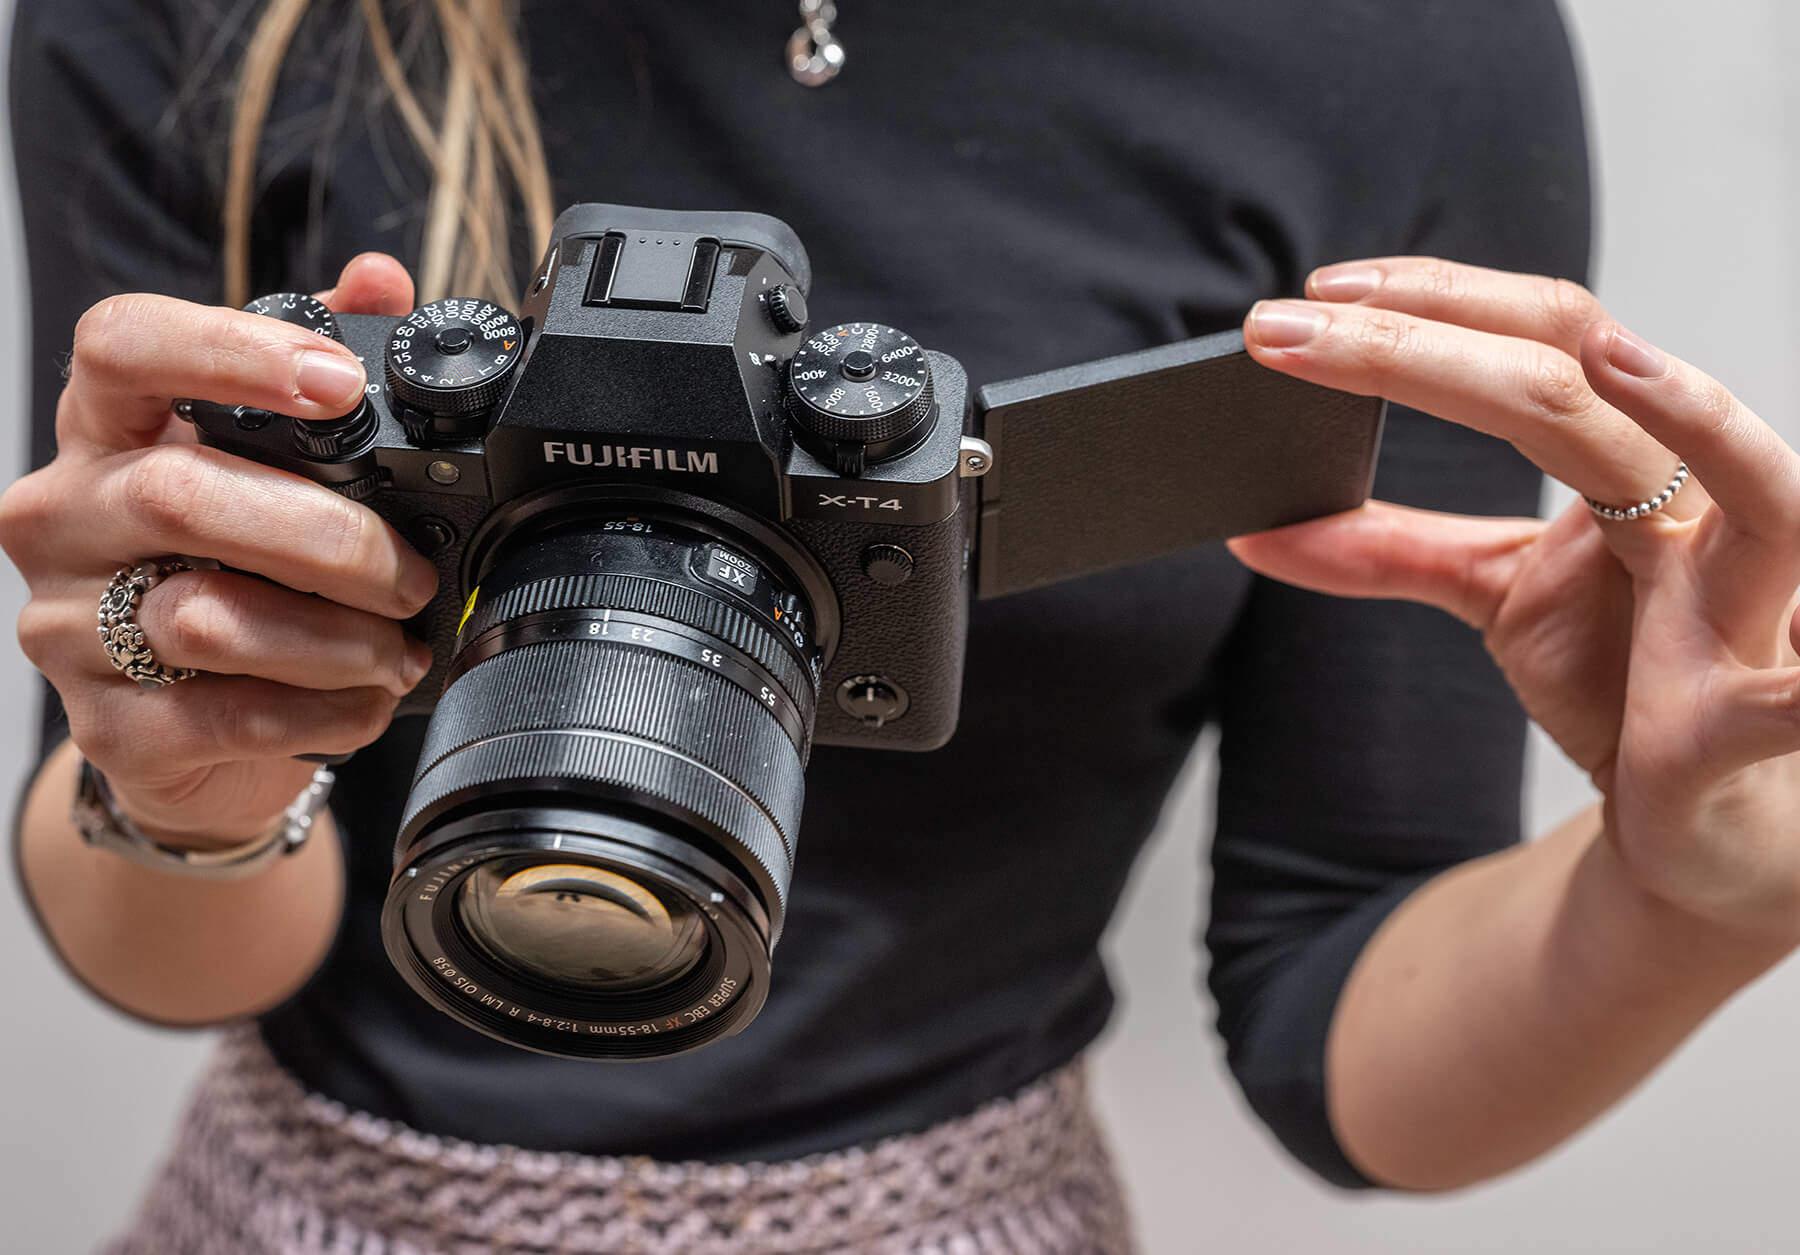 Fujifilm X-T4 hands on